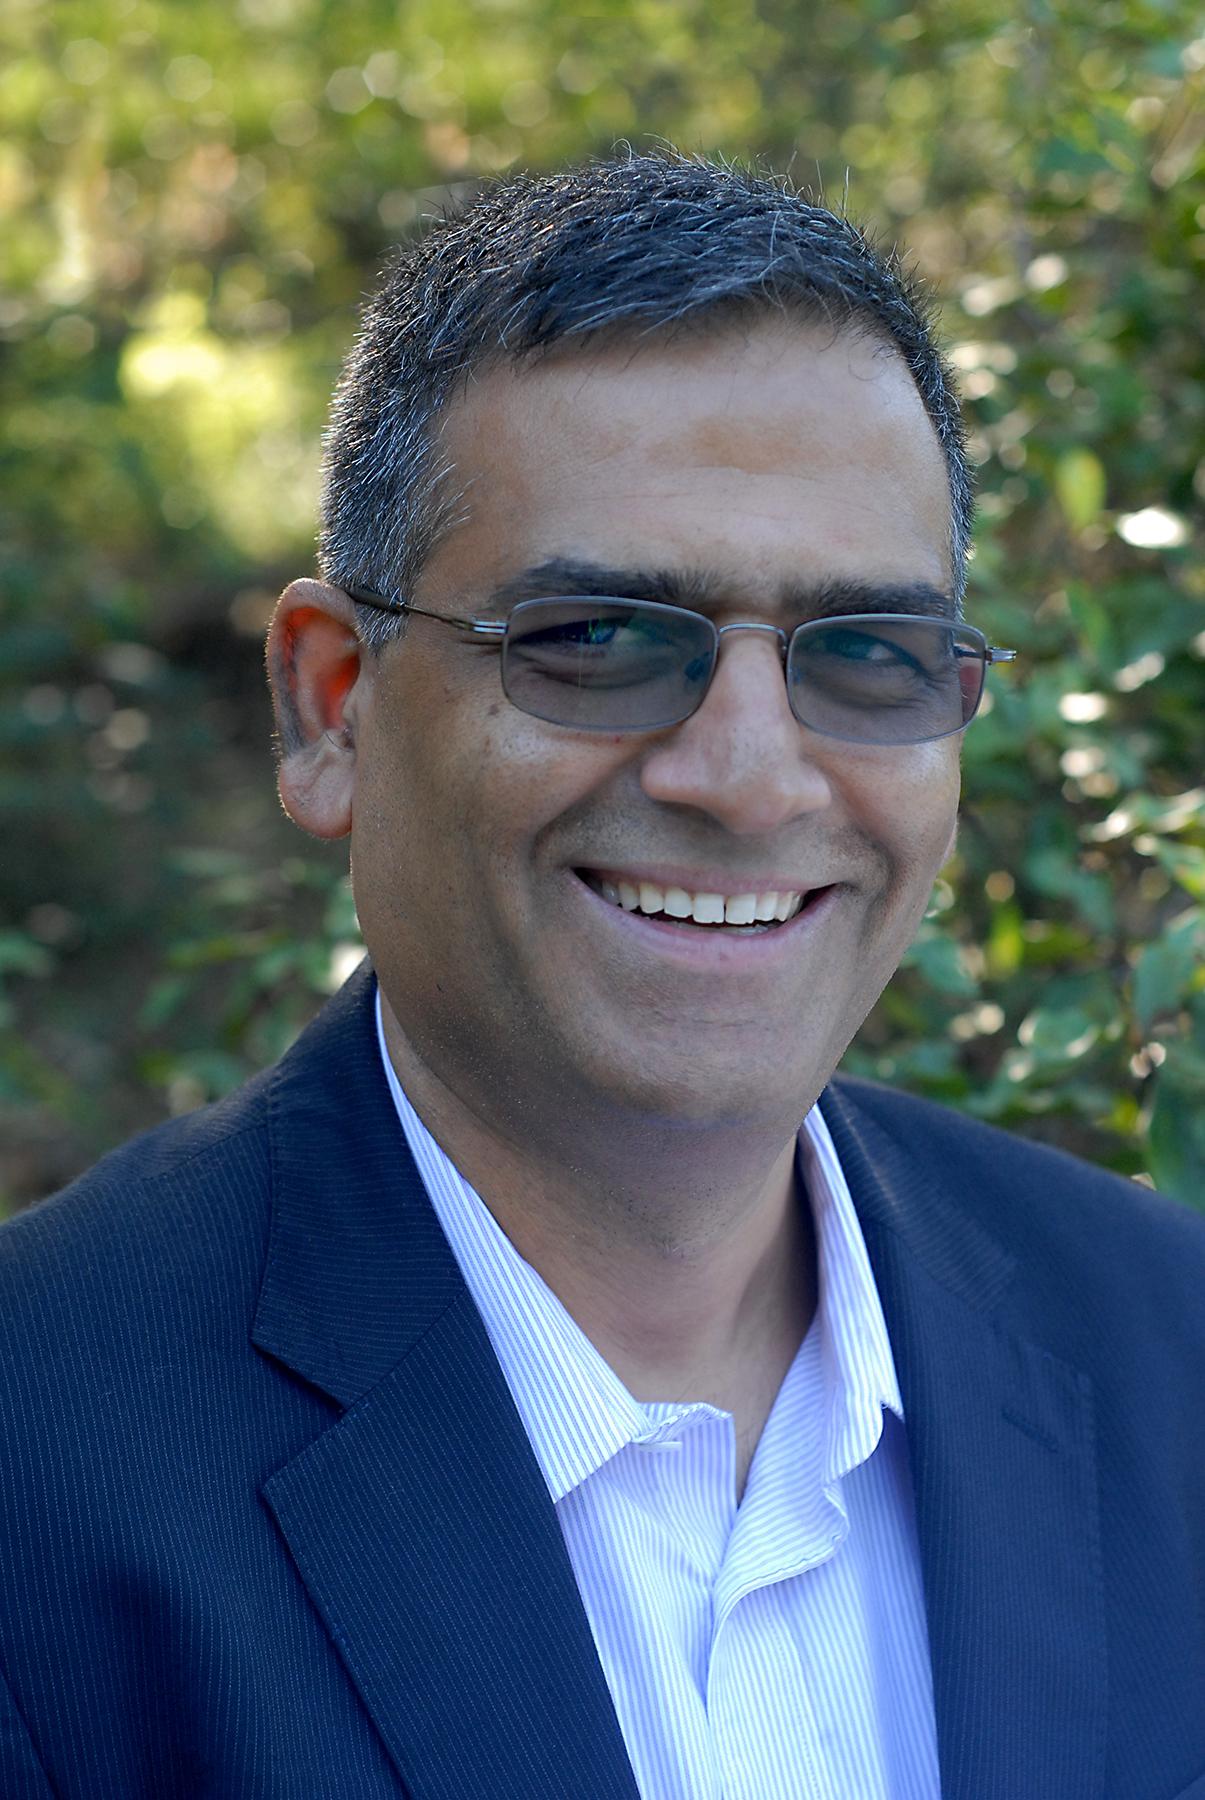 Khalid Mohammad